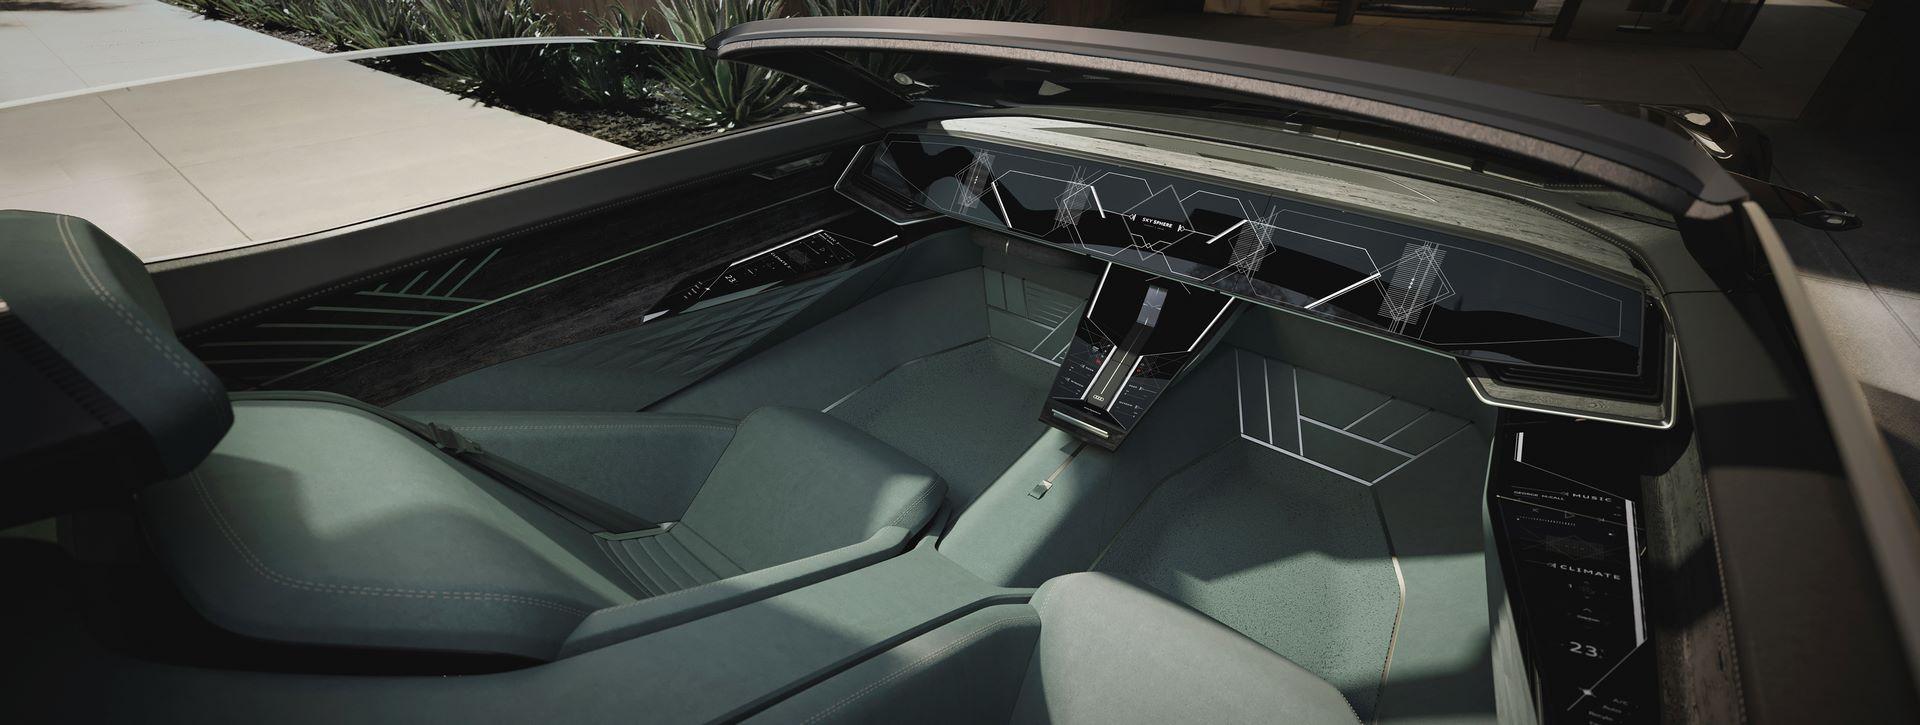 Audi-Skysphere-Concept-22